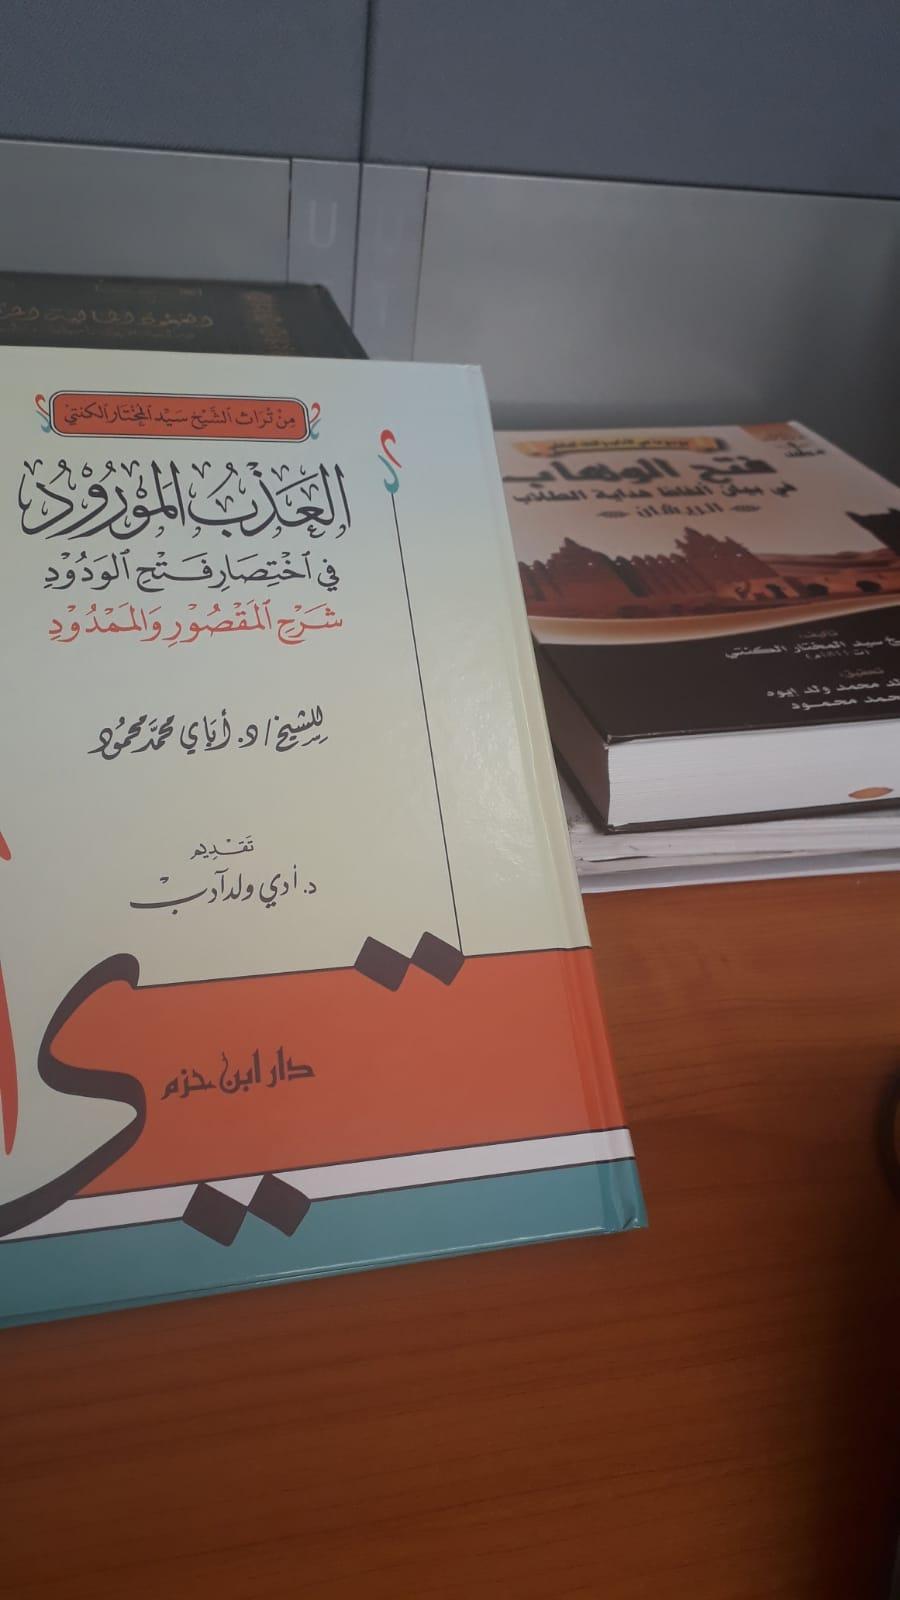 312340145946a صدورتأليف جديد بعنوان  العذب المورود فى اختصار فتح الودود للدكتور أبايه  محمد محمود